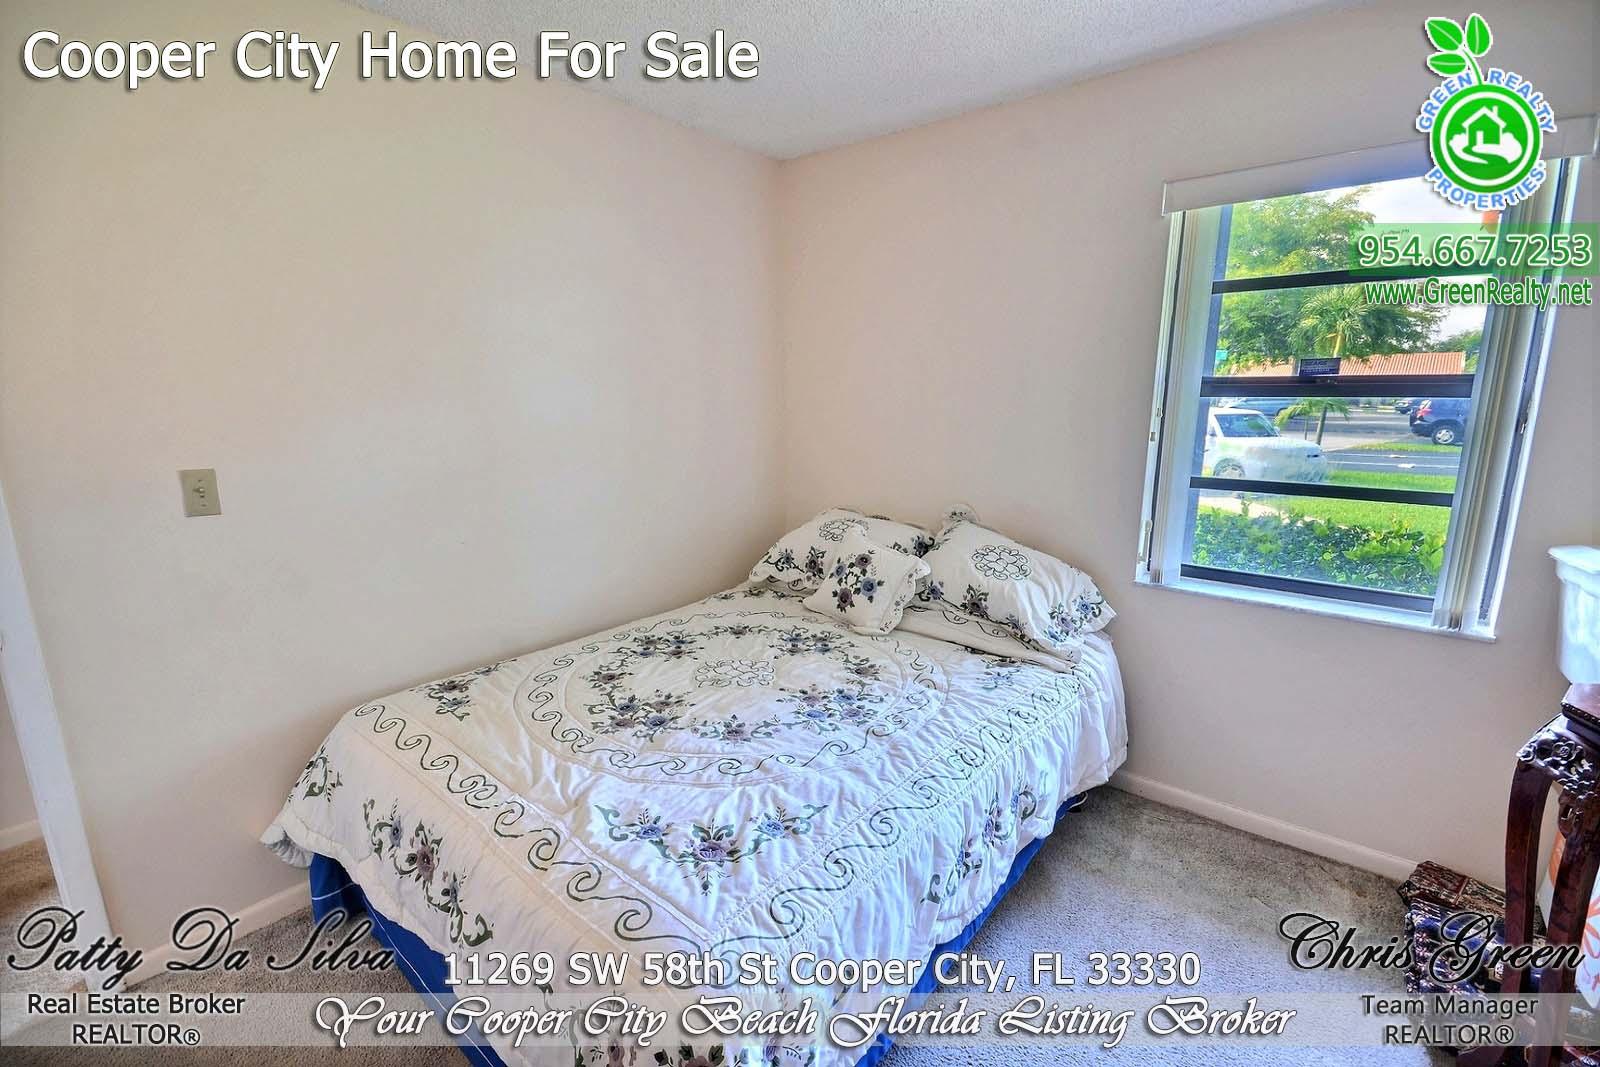 17 Cooper City Real Estate - Villas (24)